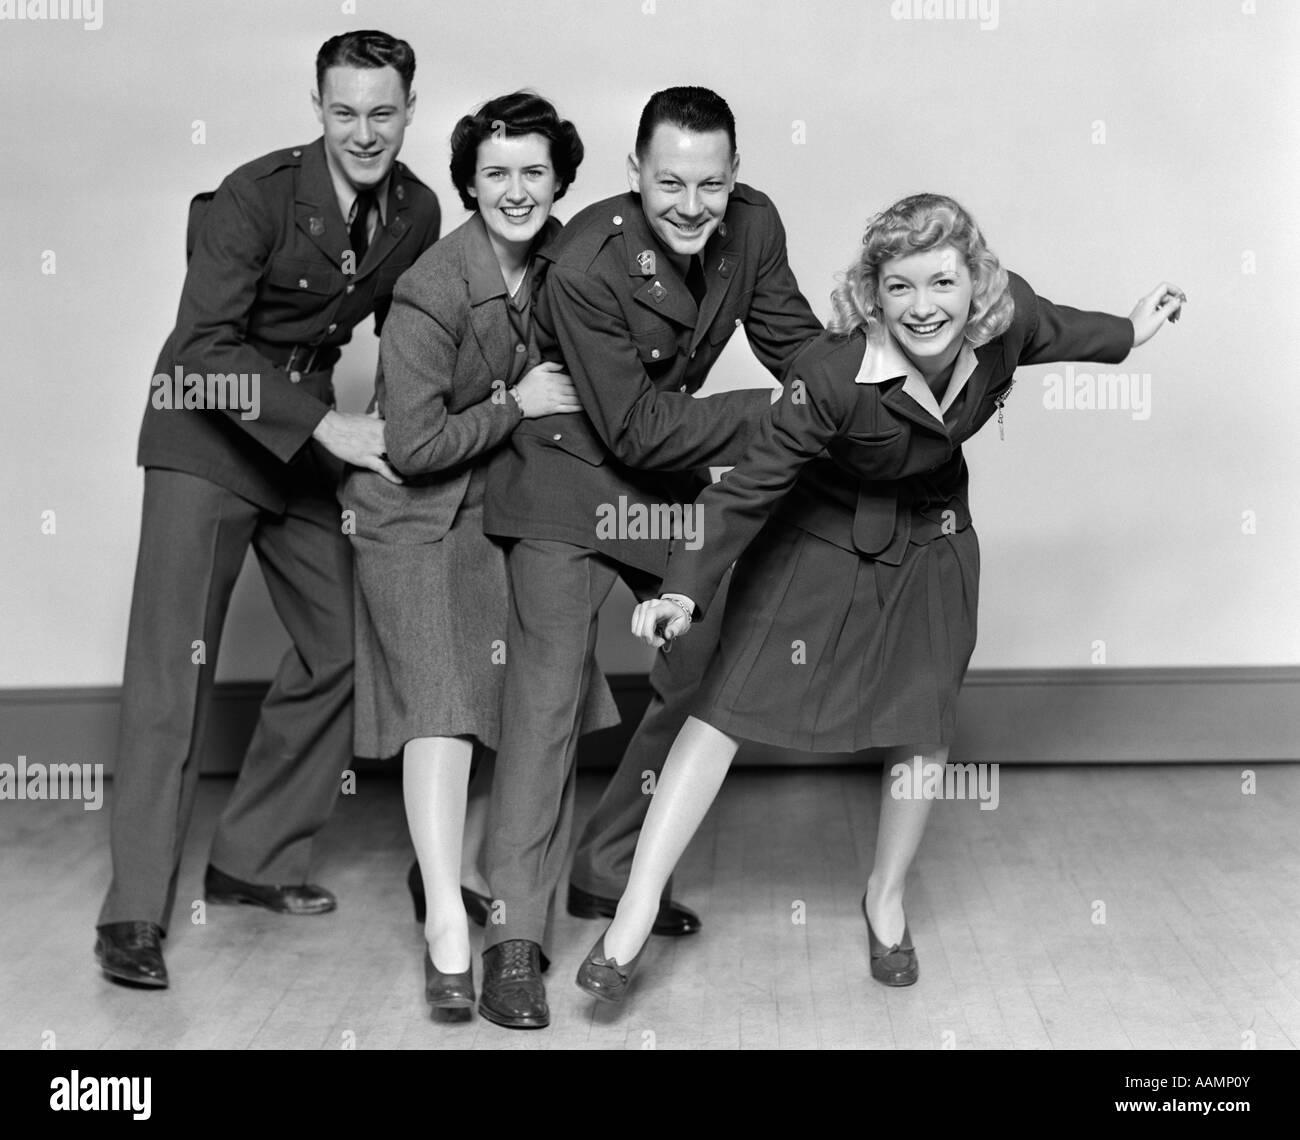 1940 LIGNE CONGA DEUX HOMMES ET DEUX FEMMES SOLDATS DANCING SMILING AT CAMERA Photo Stock